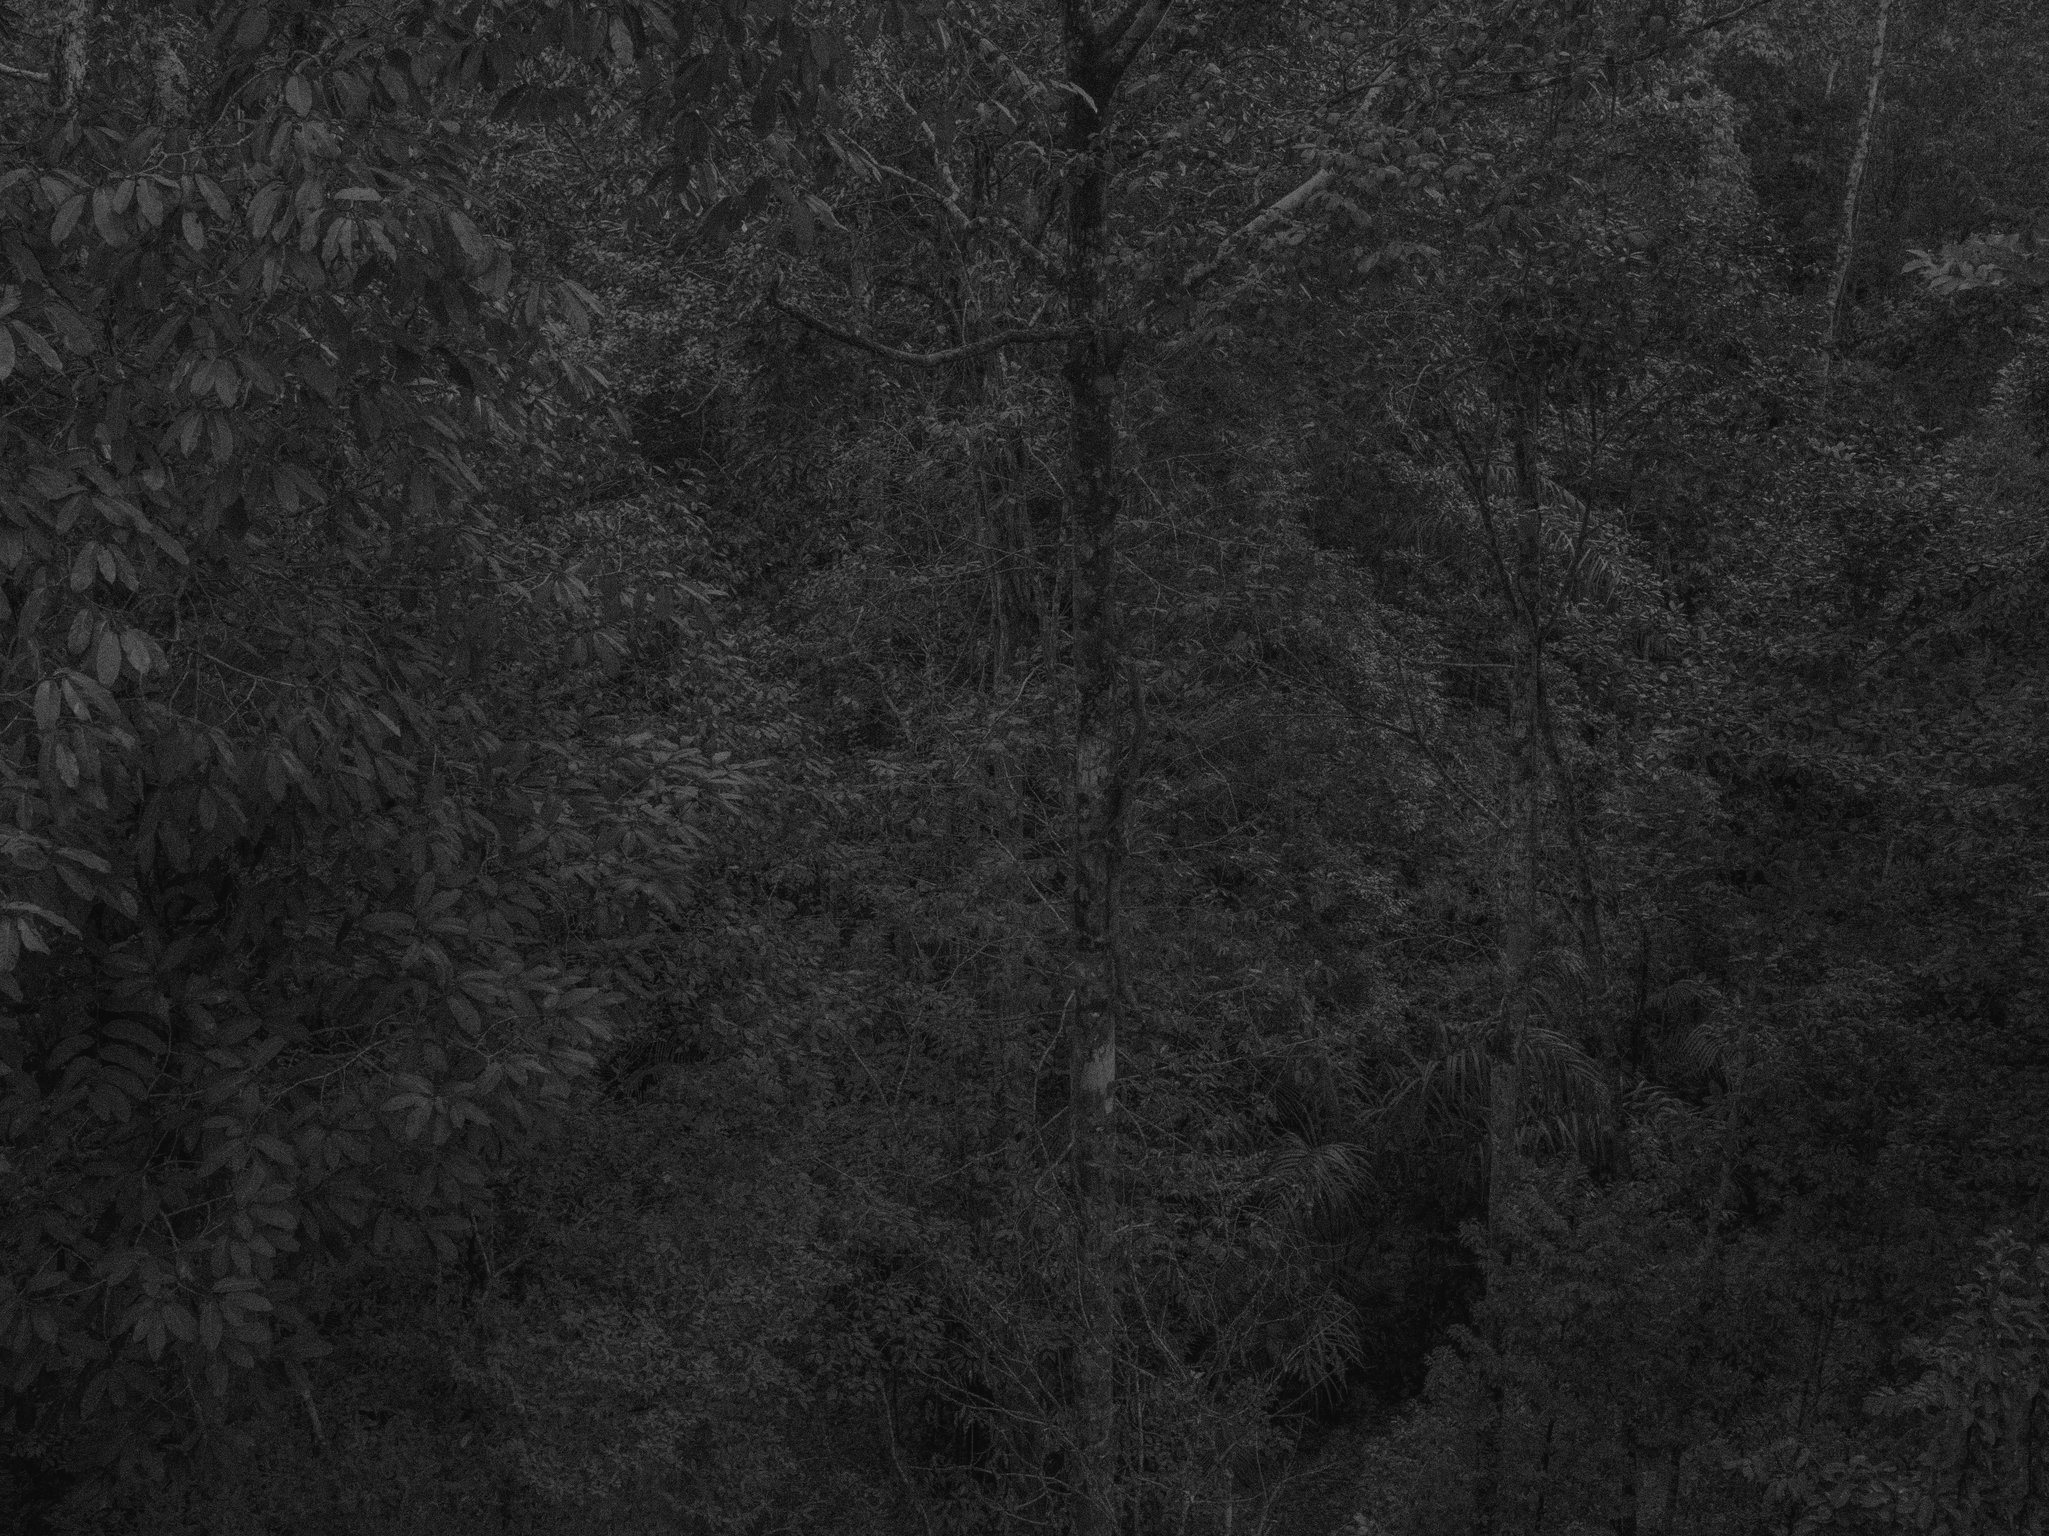 Paul-Cupido-Amazonia-Sense-of-Place-CMYK.jpg